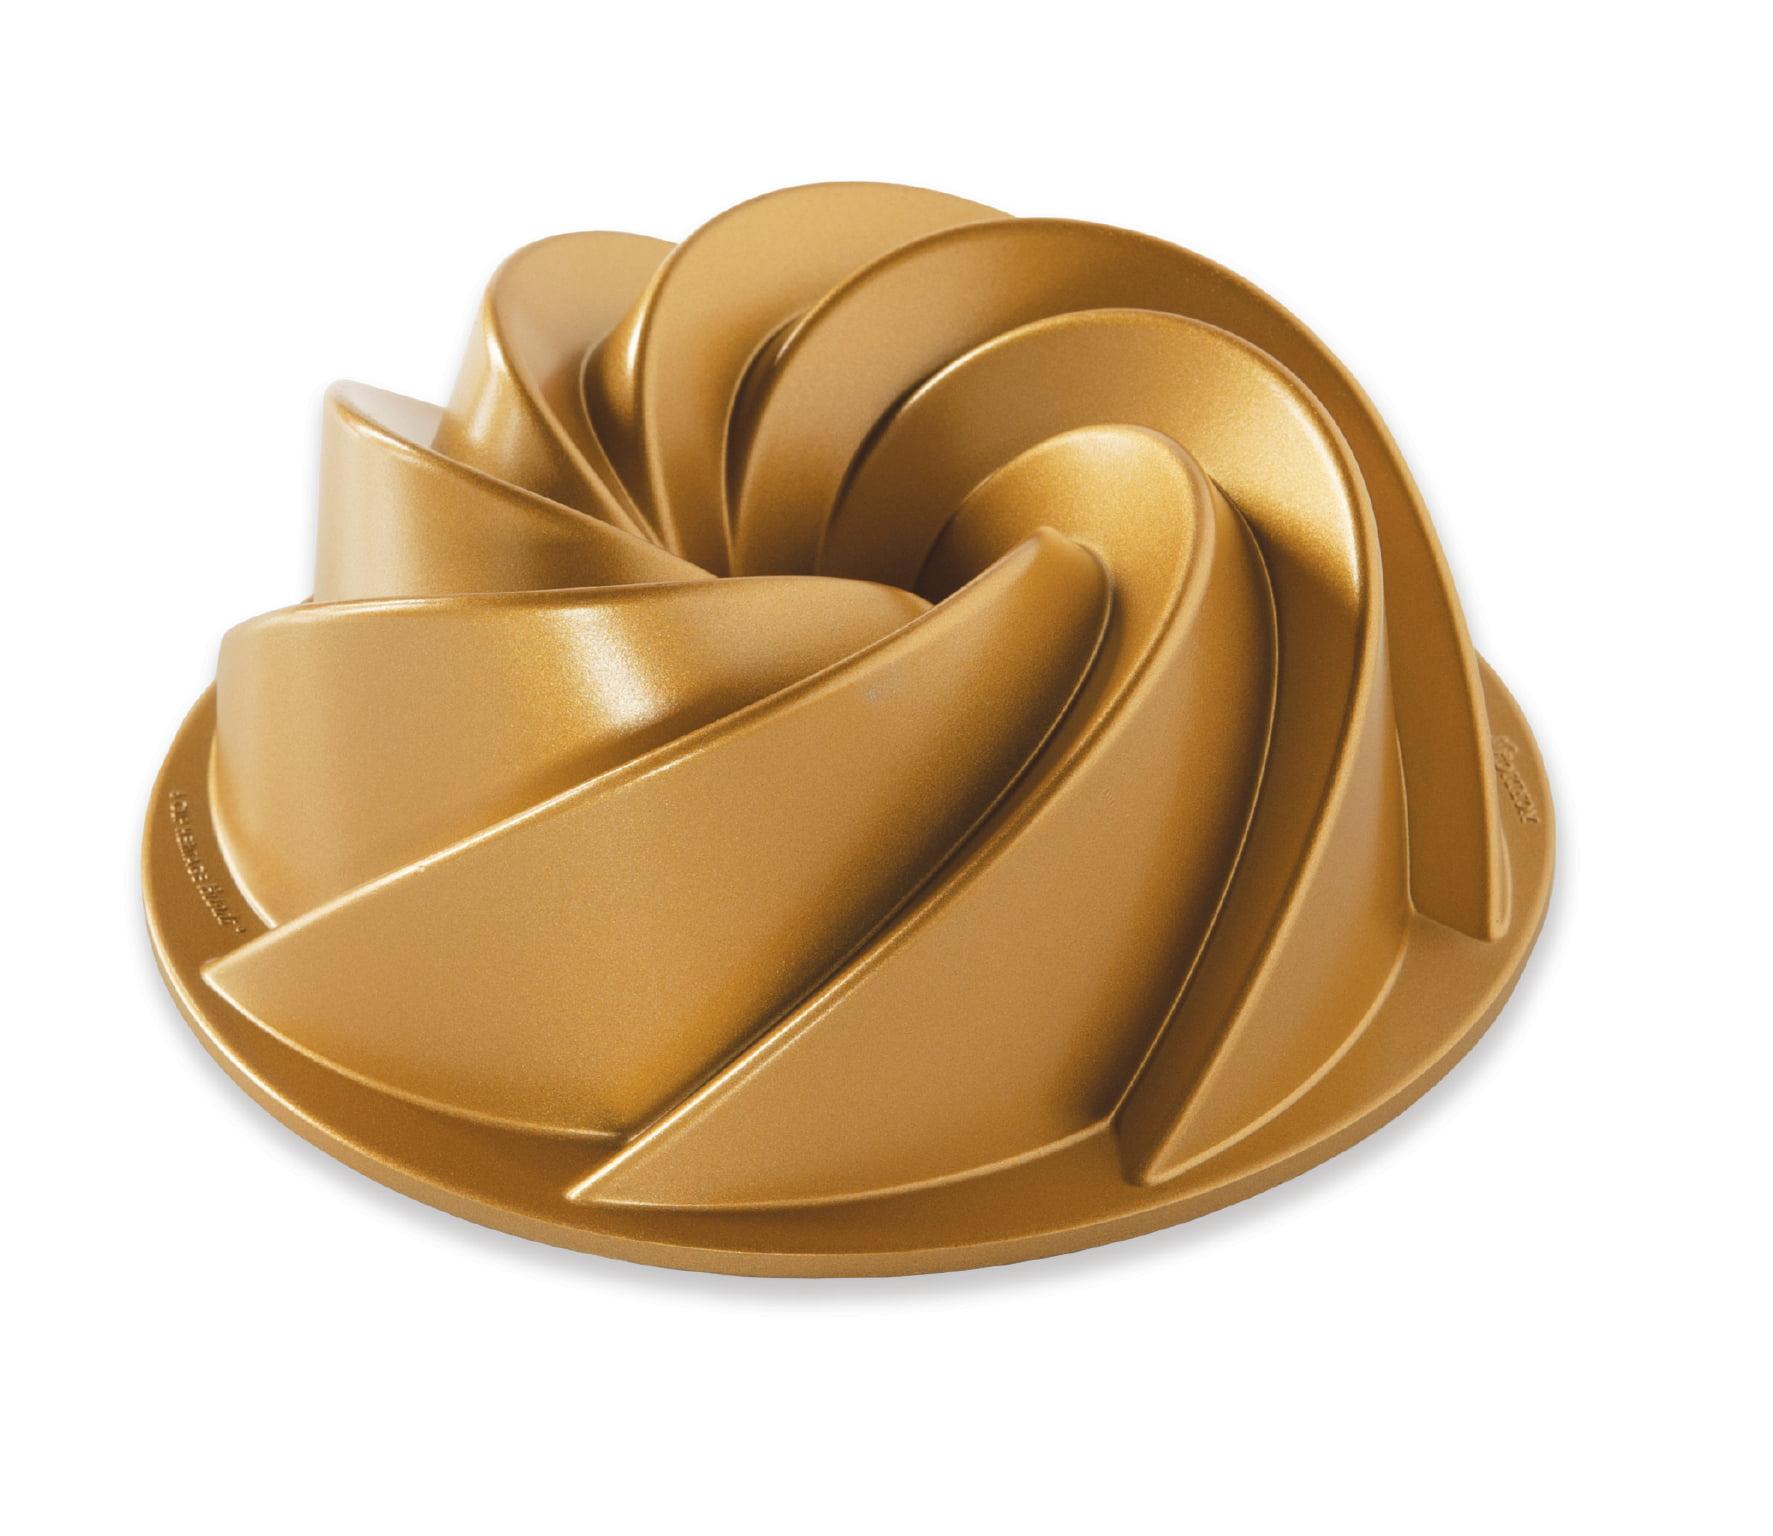 Nordic Ware 90077 Heritage Bundt Pan, Gold by Nordic Ware